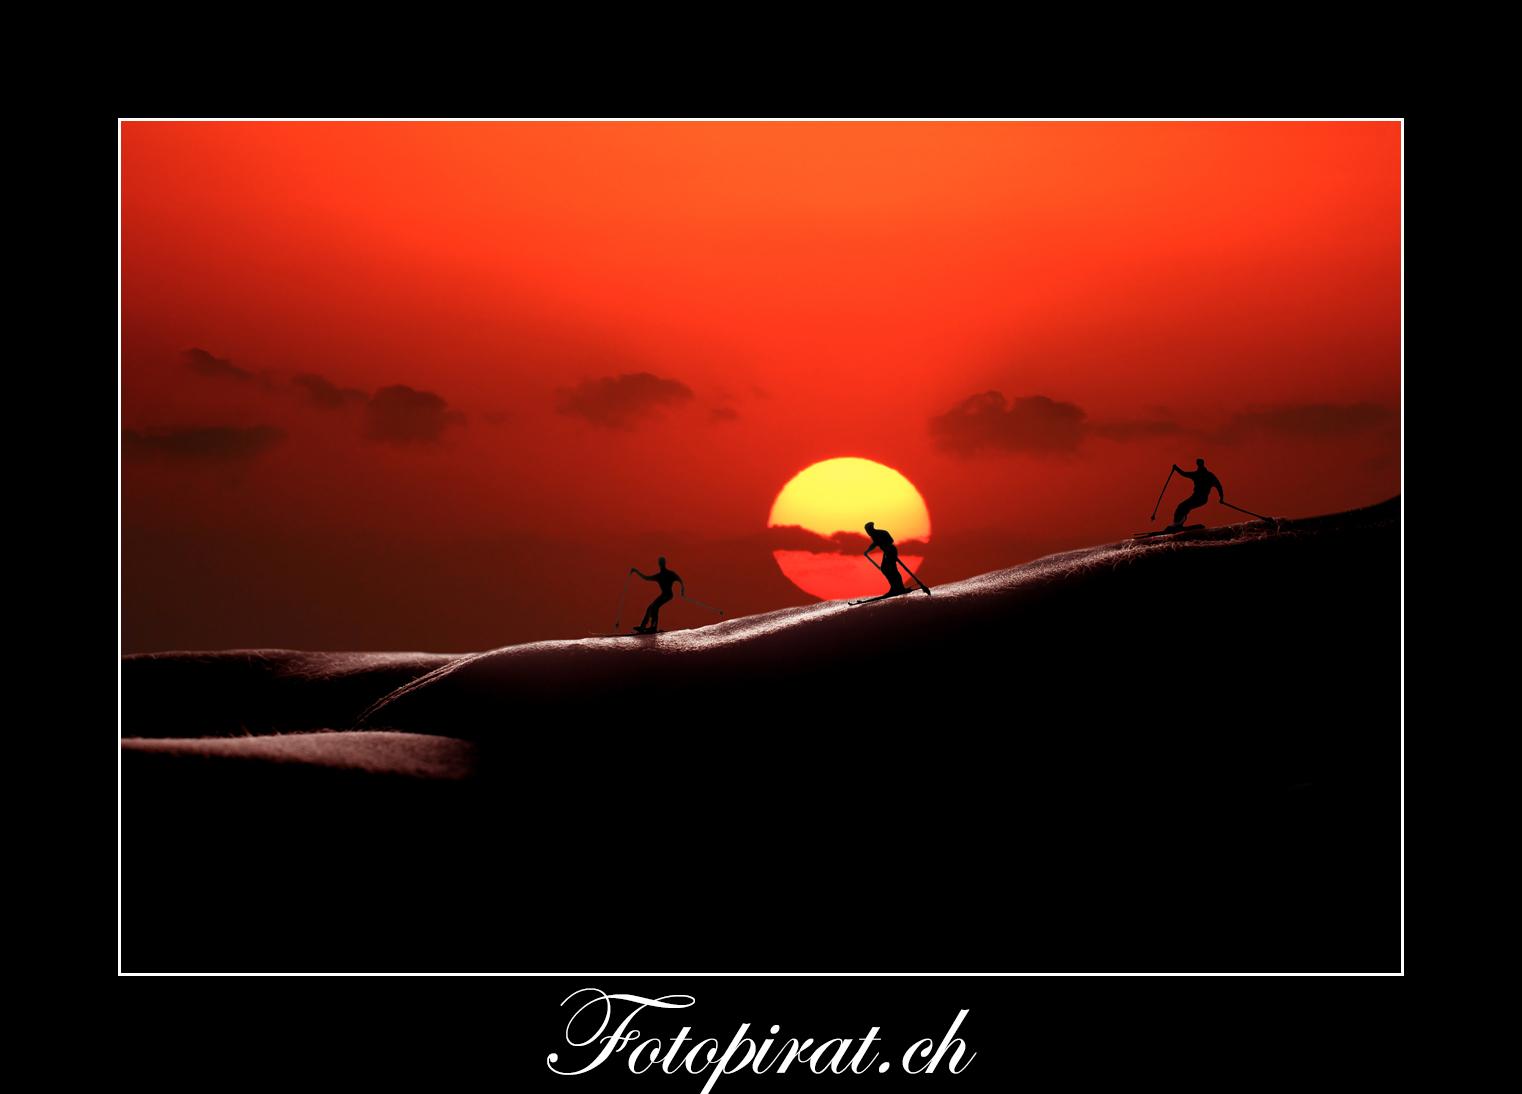 Bodyscapes, Bodypart, Skifahrer, Sunset